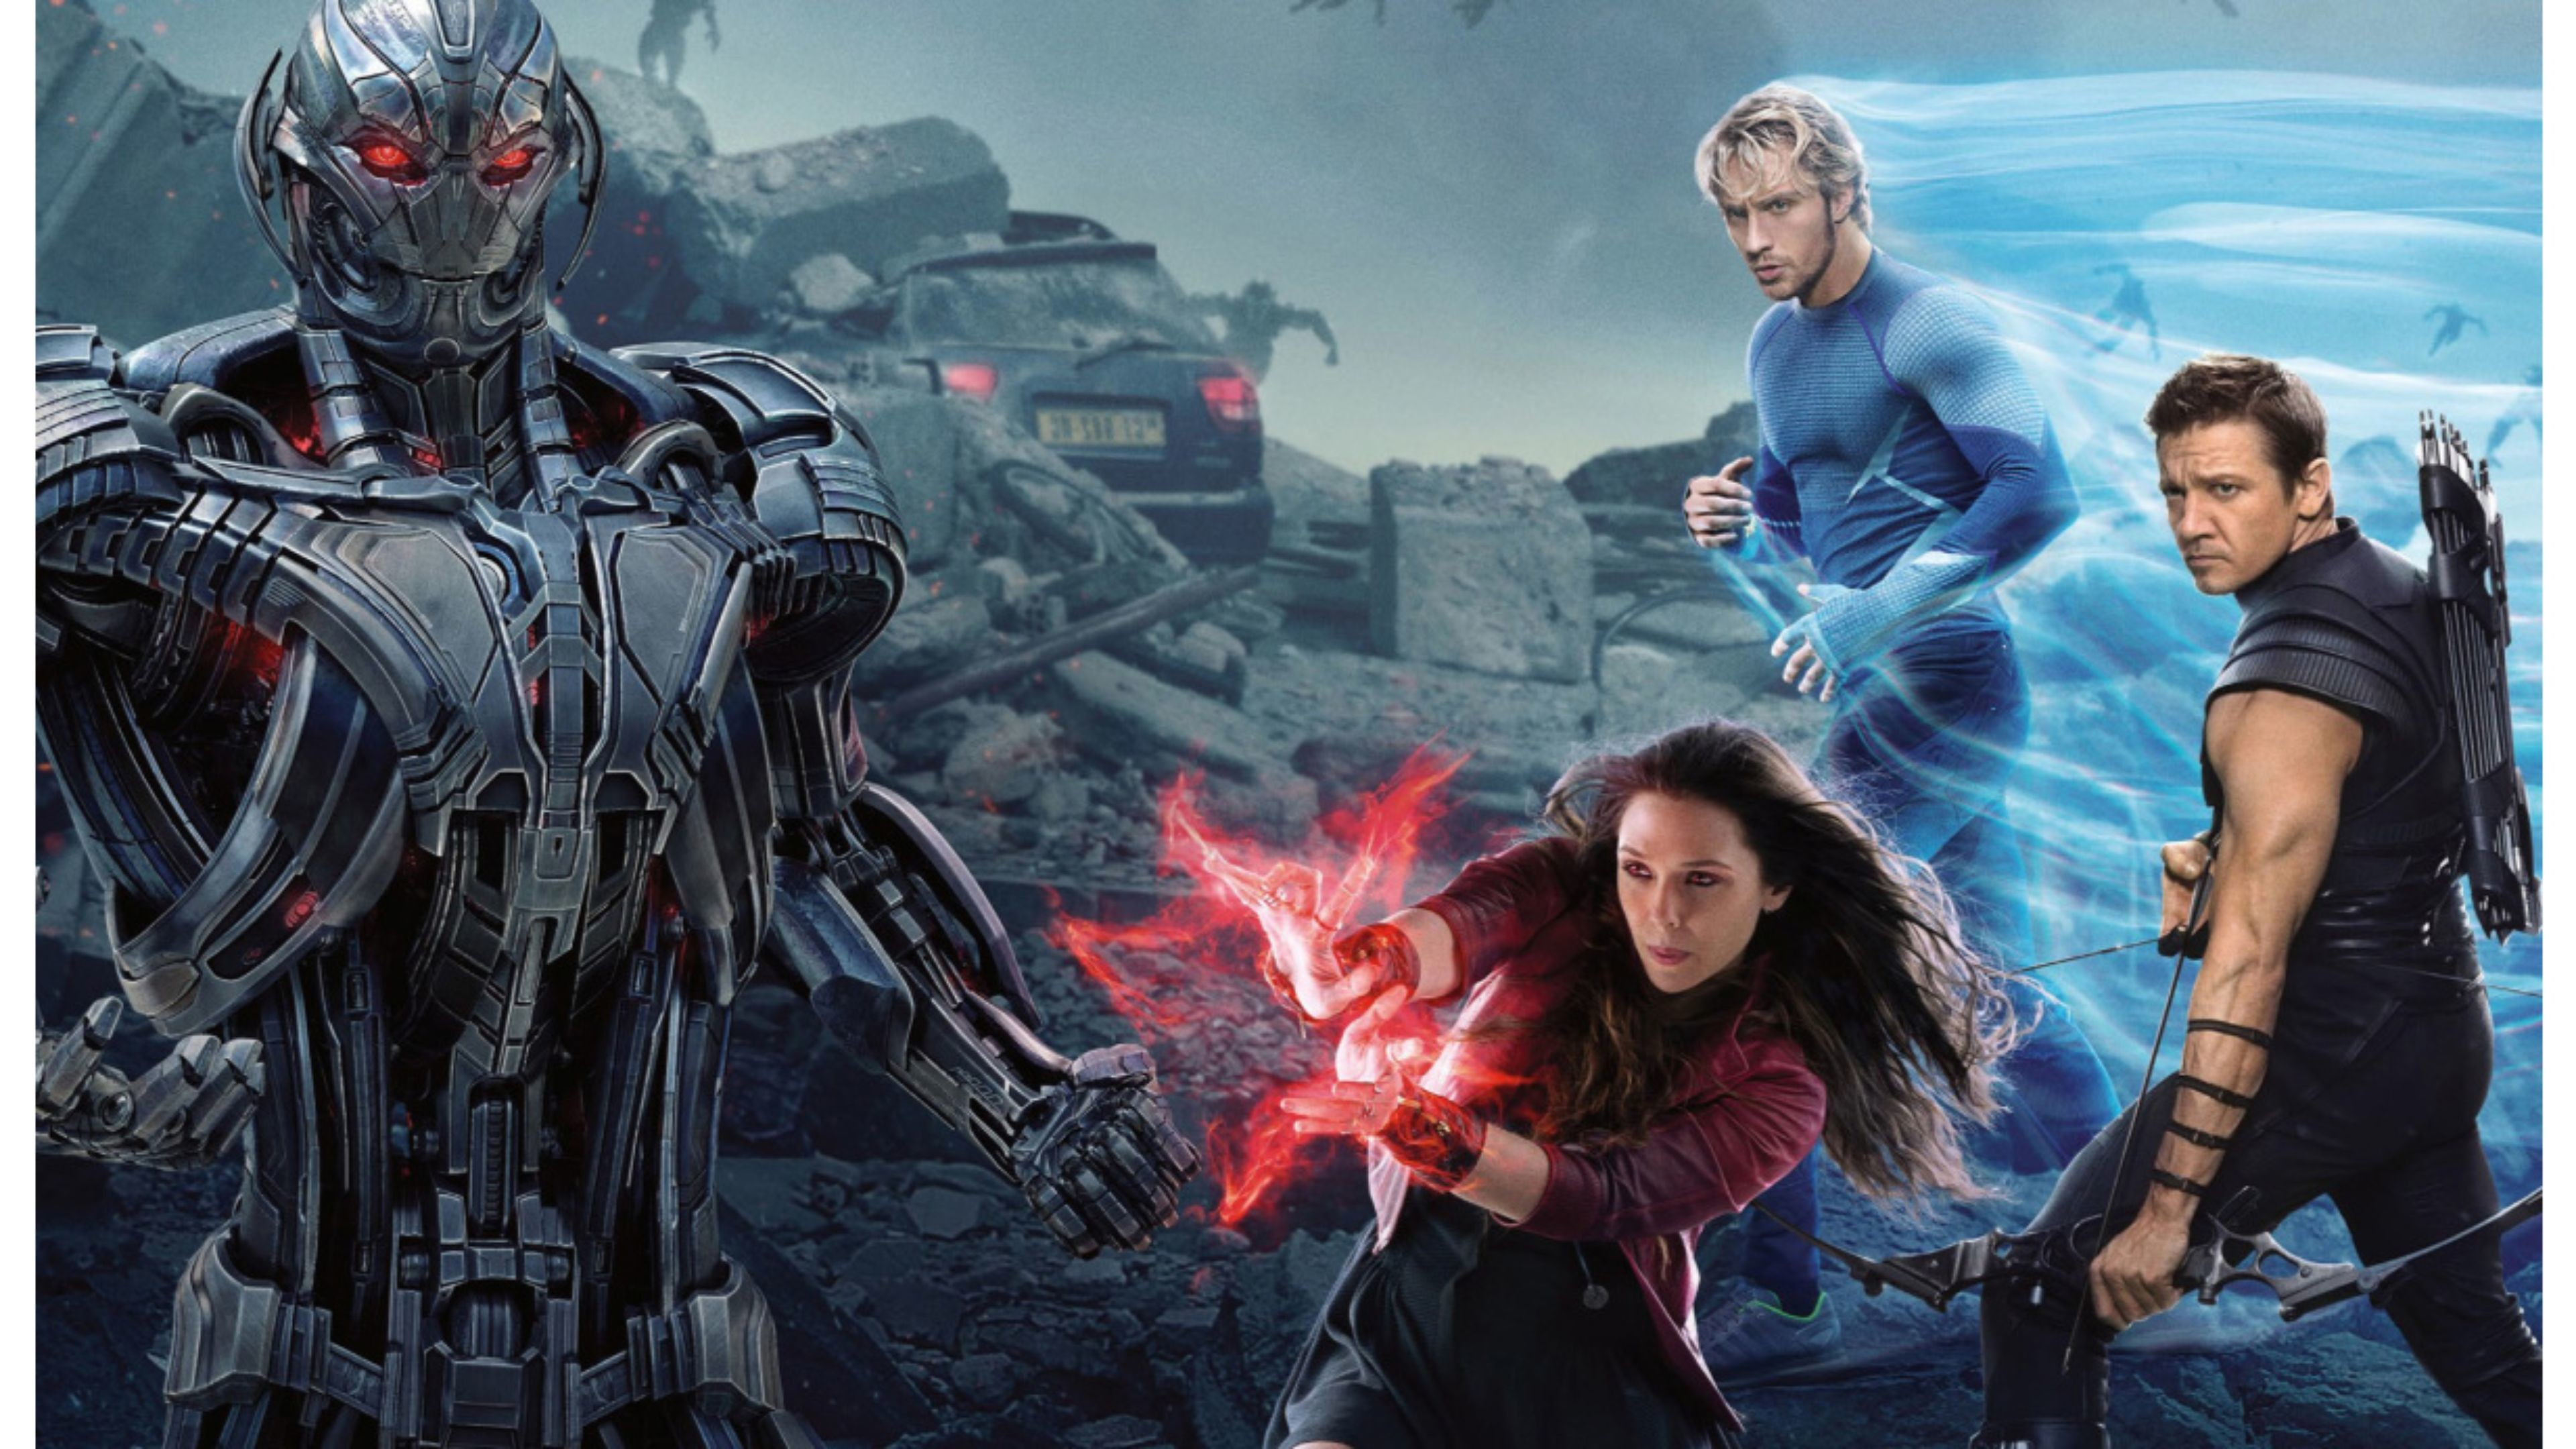 3840x2160 Best 4K Avengers Age Of Ultron Wallpaper